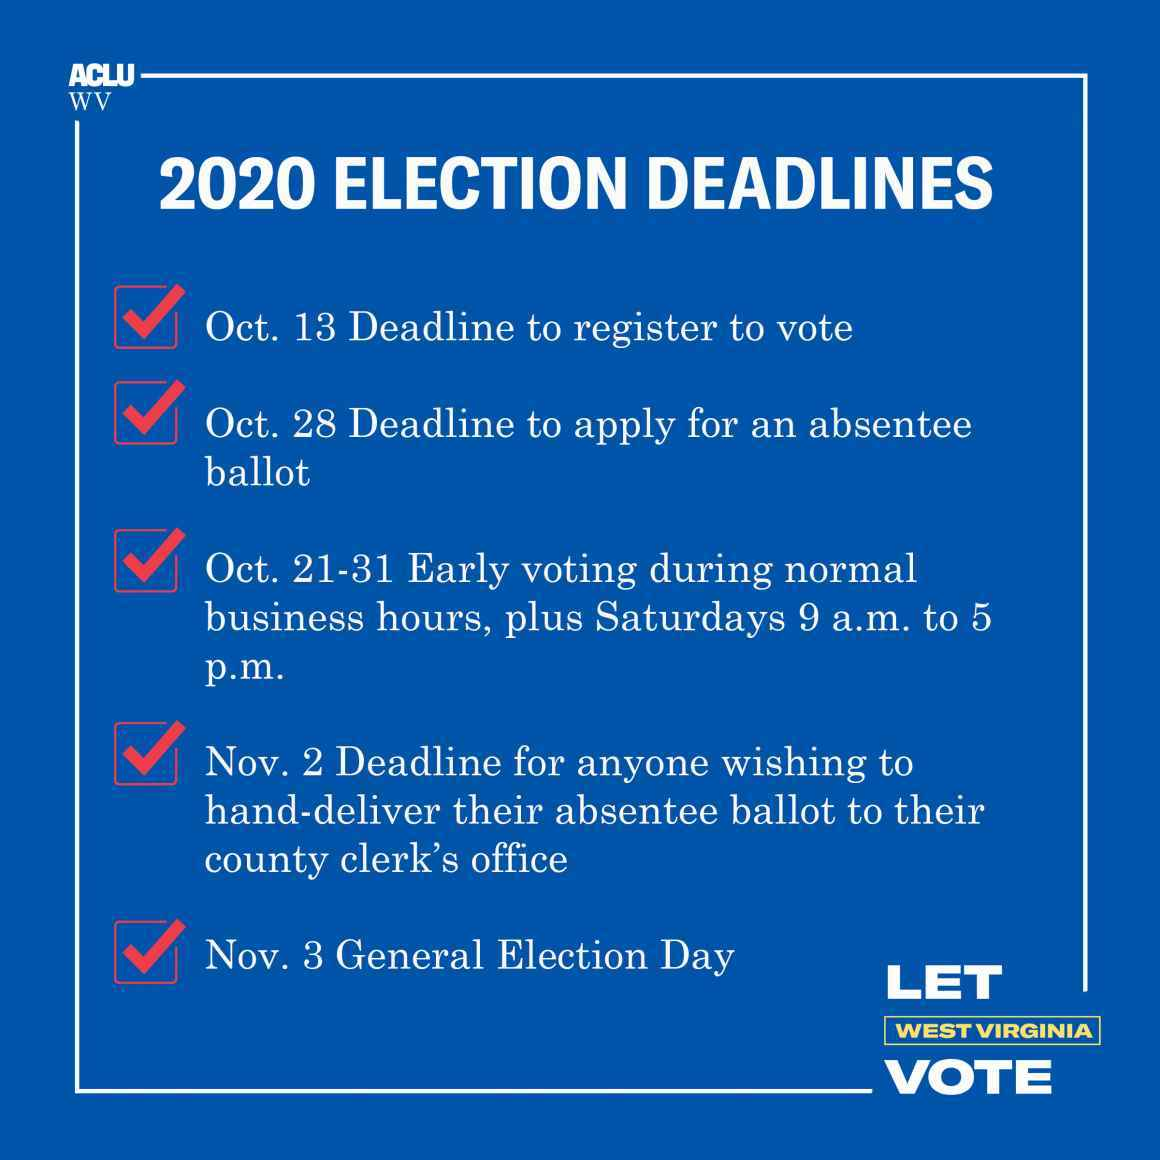 2020 Election Deadlines